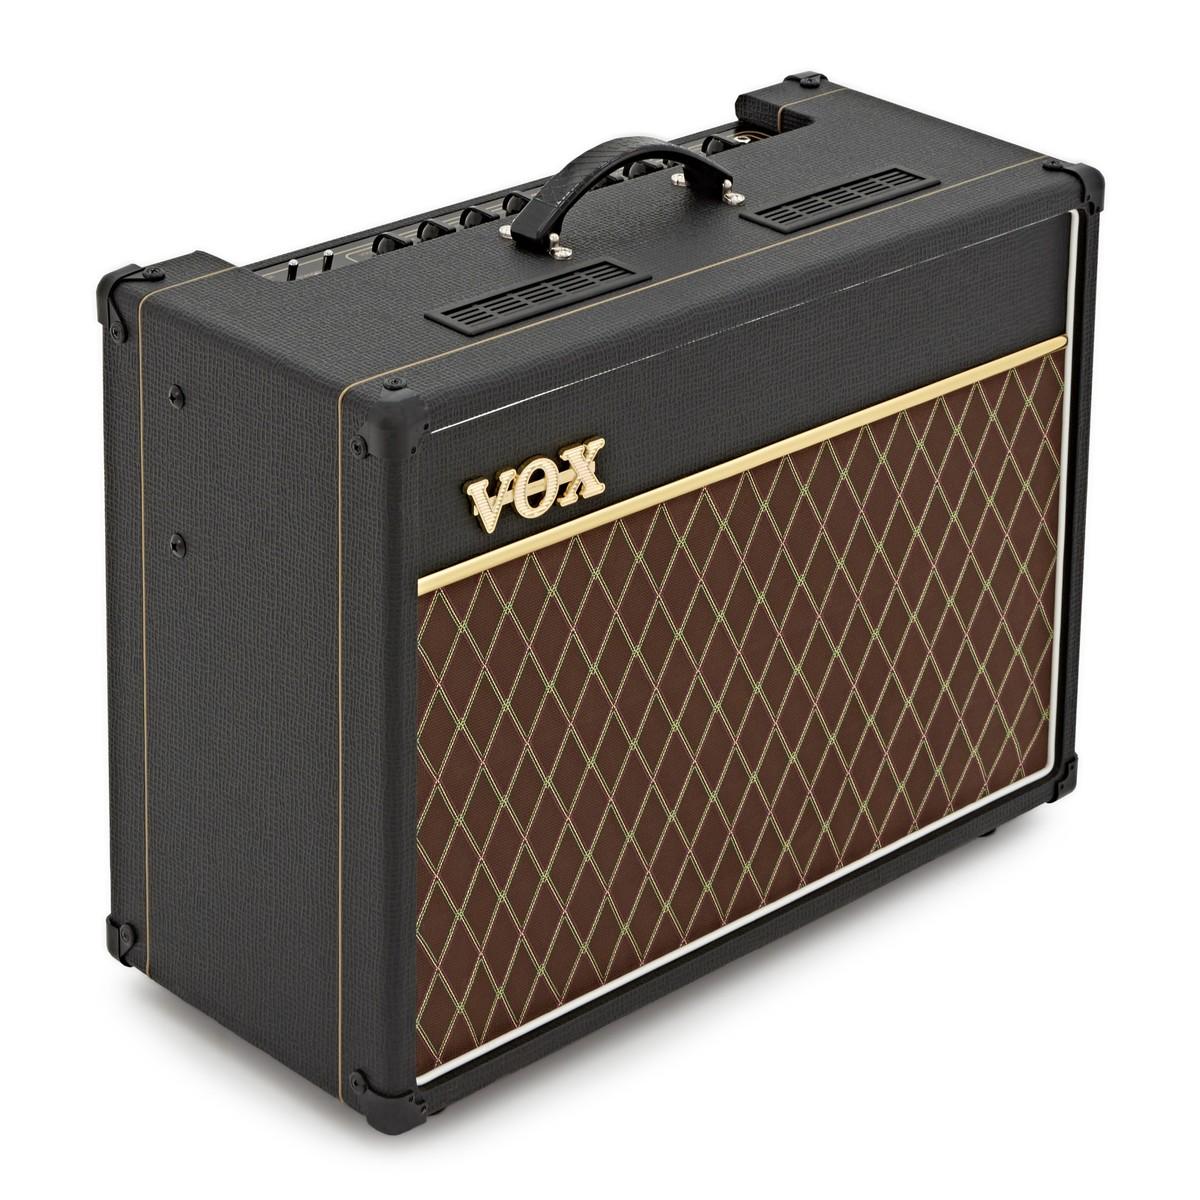 Vox serial number dating wah pedal